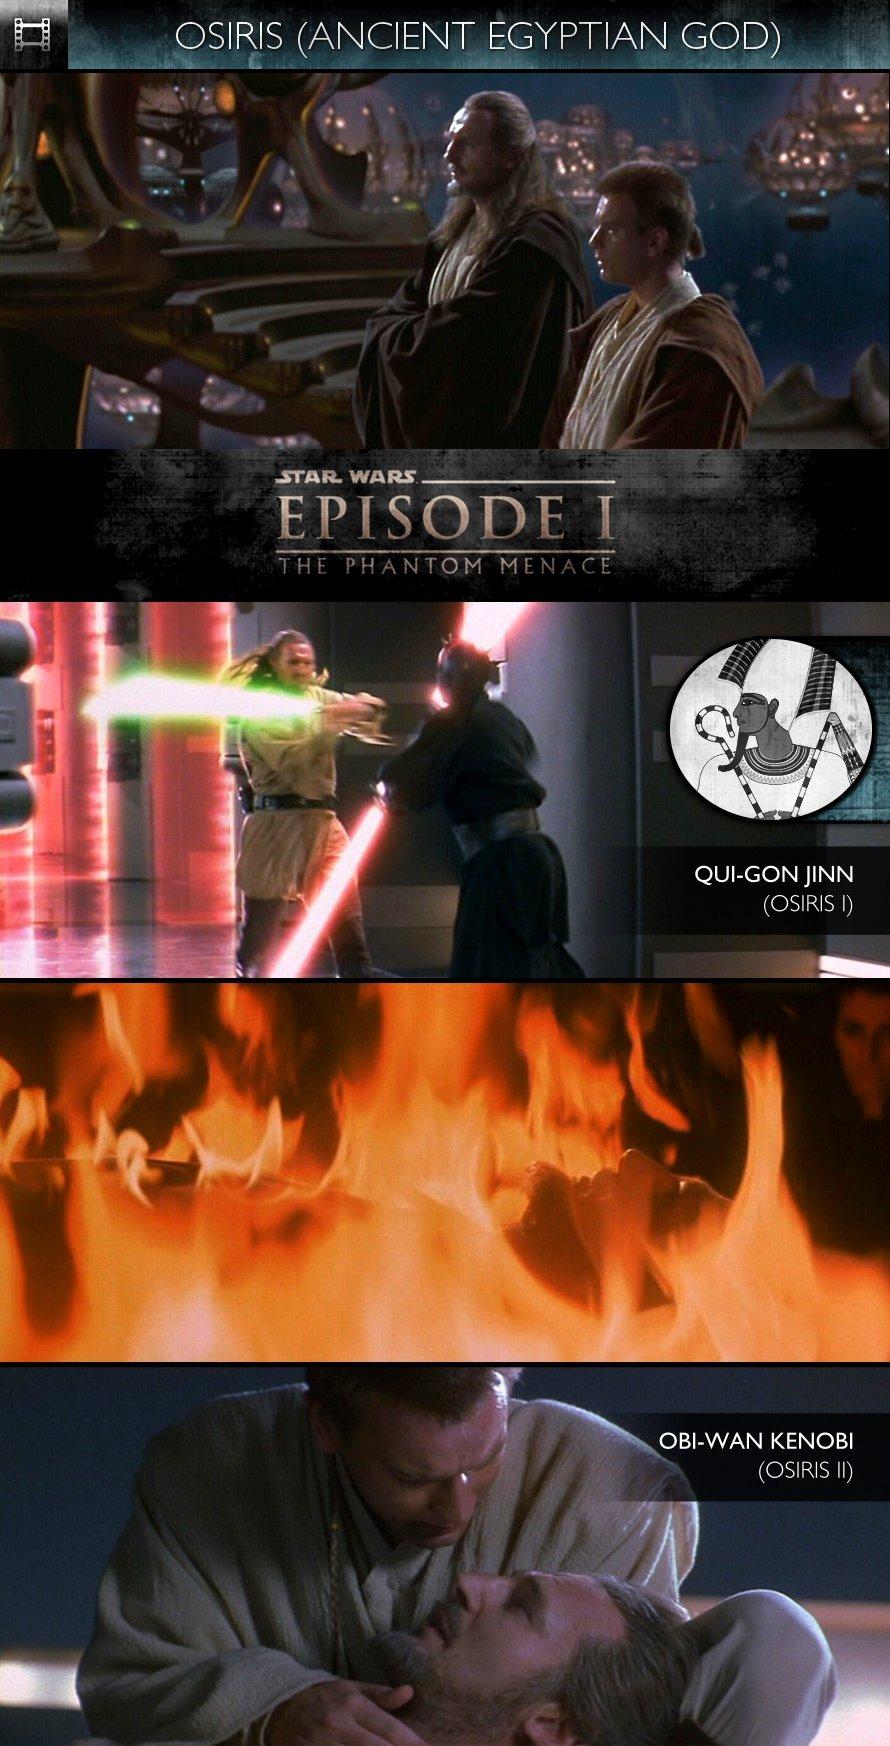 OSIRIS - Star Wars - Episode I: The Phantom Menace (1999) - Qui-Gon Jinn & Obi-Wan Kenobi